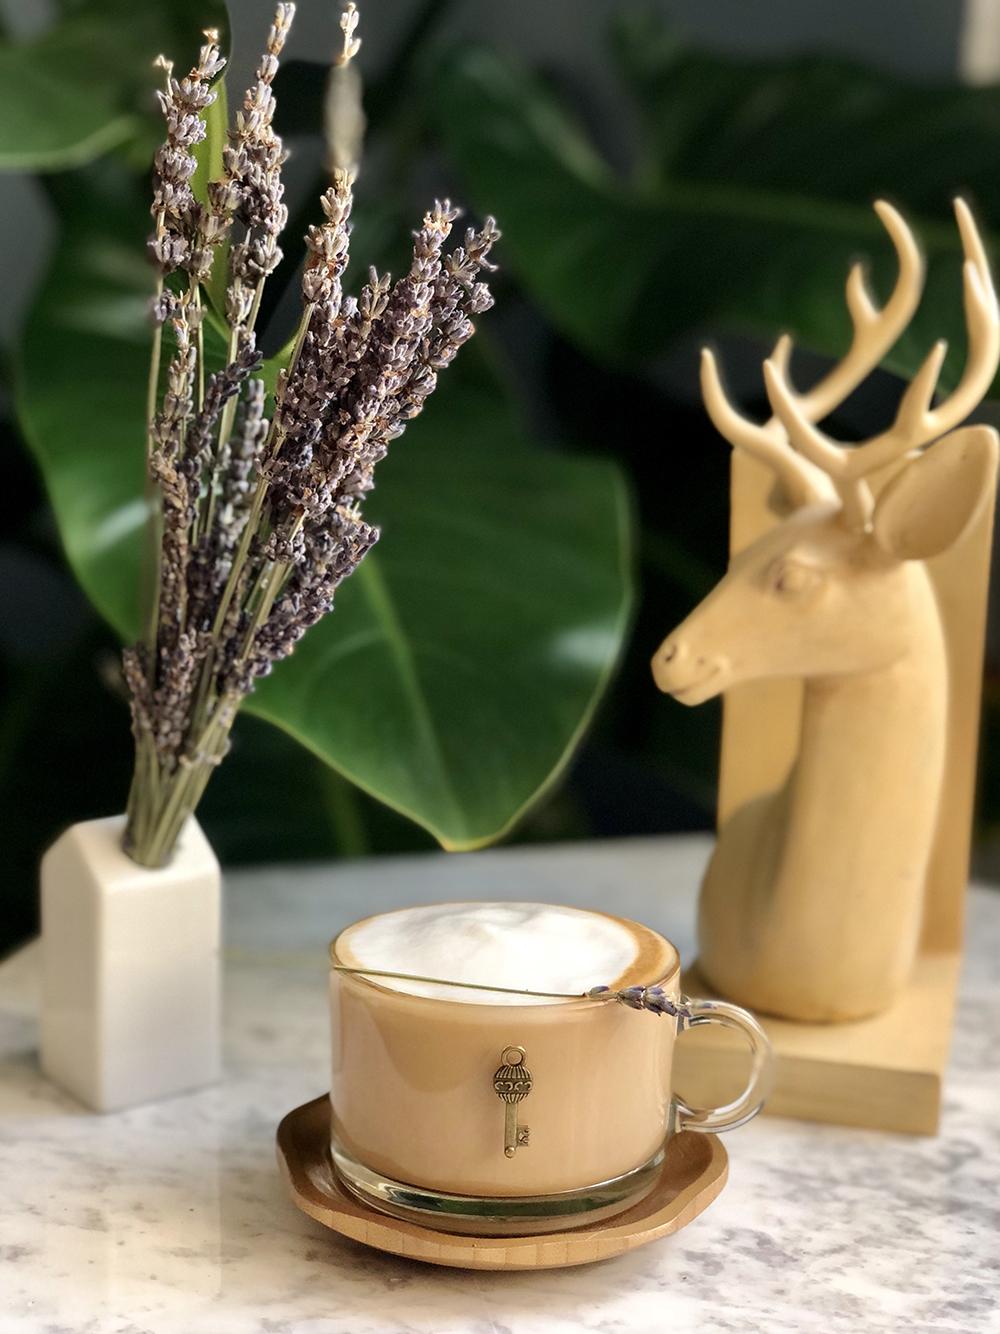 key mug Gifts Gifts